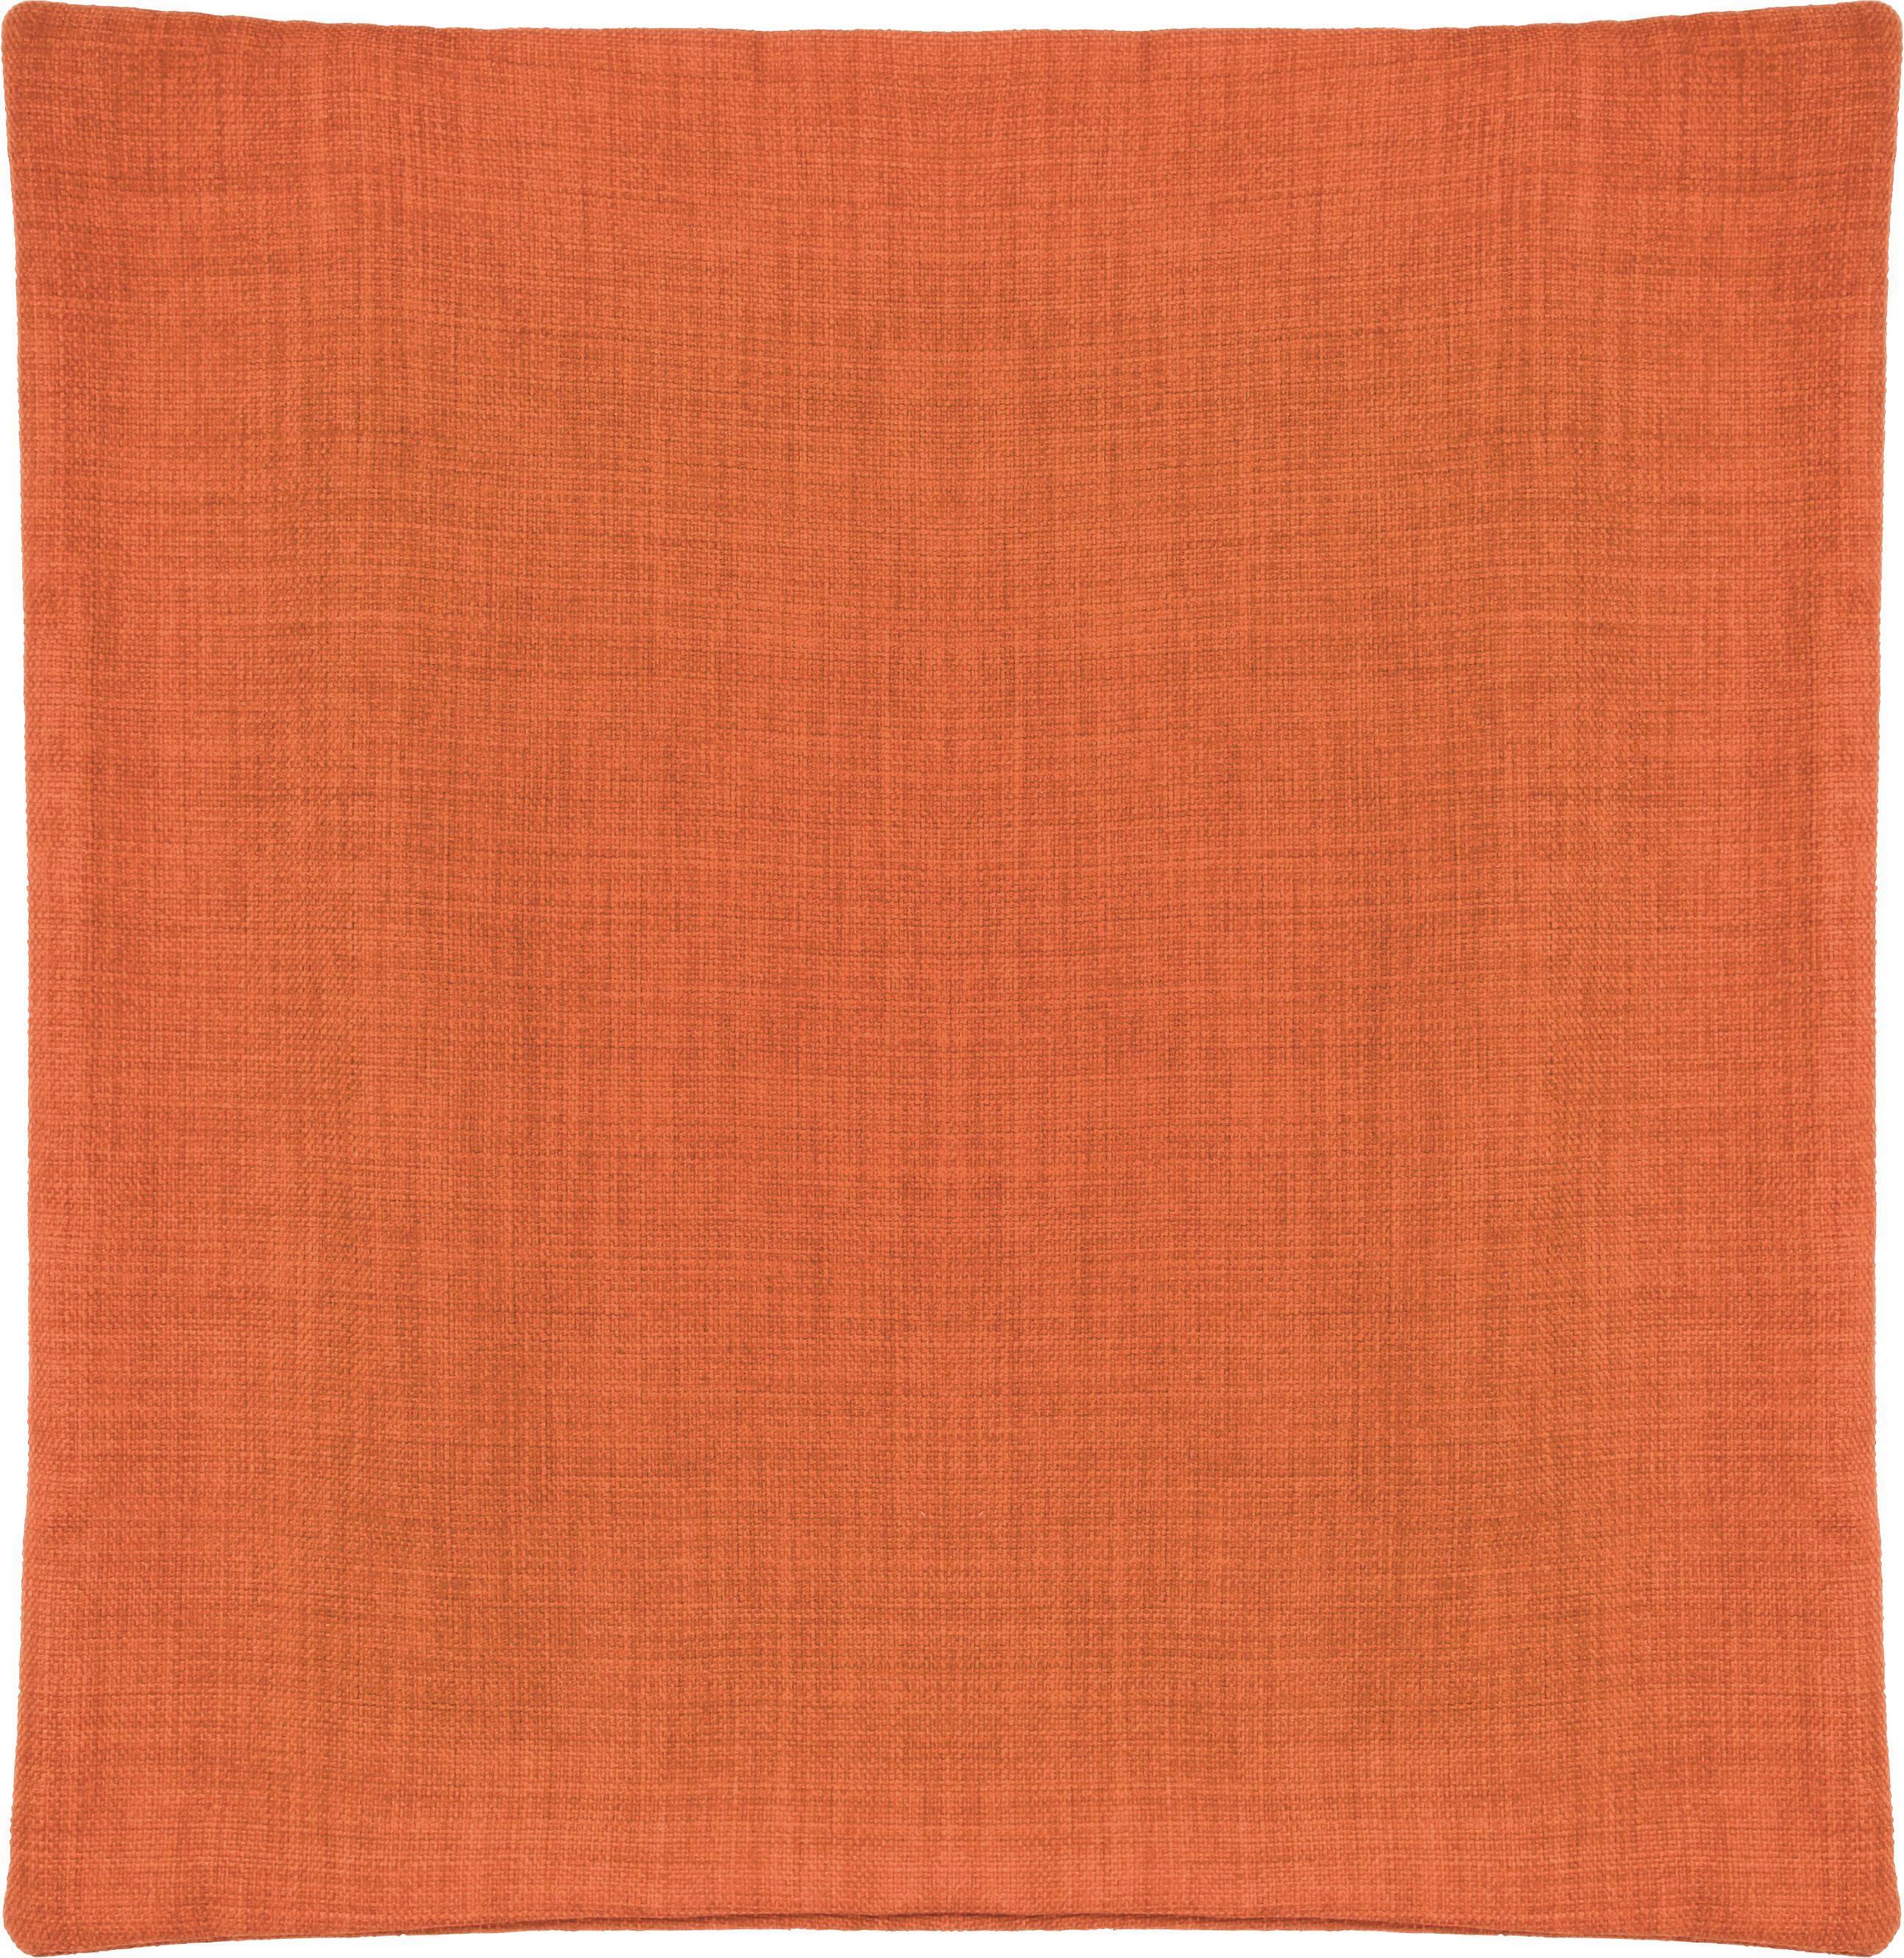 Kissenhülle Leinenoptik, ca. 50x50cm - Orange, KONVENTIONELL, Textil (50/50cm) - MÖMAX modern living